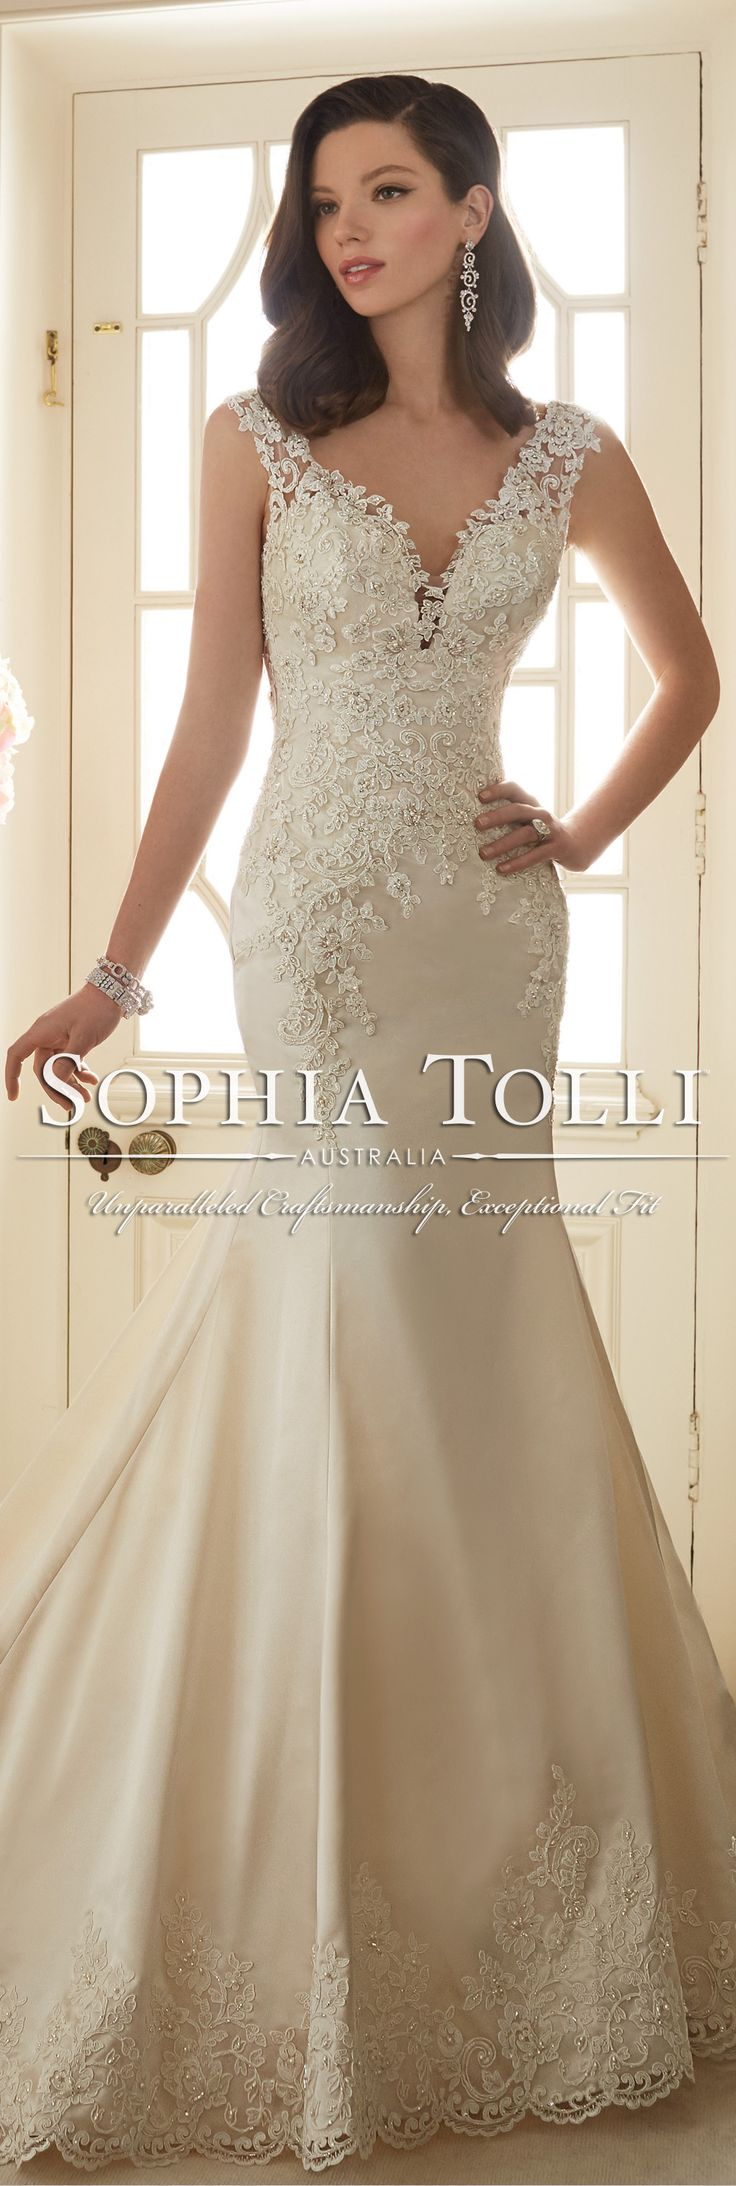 Styles of wedding dresses   best Wedding dresses images on Pinterest